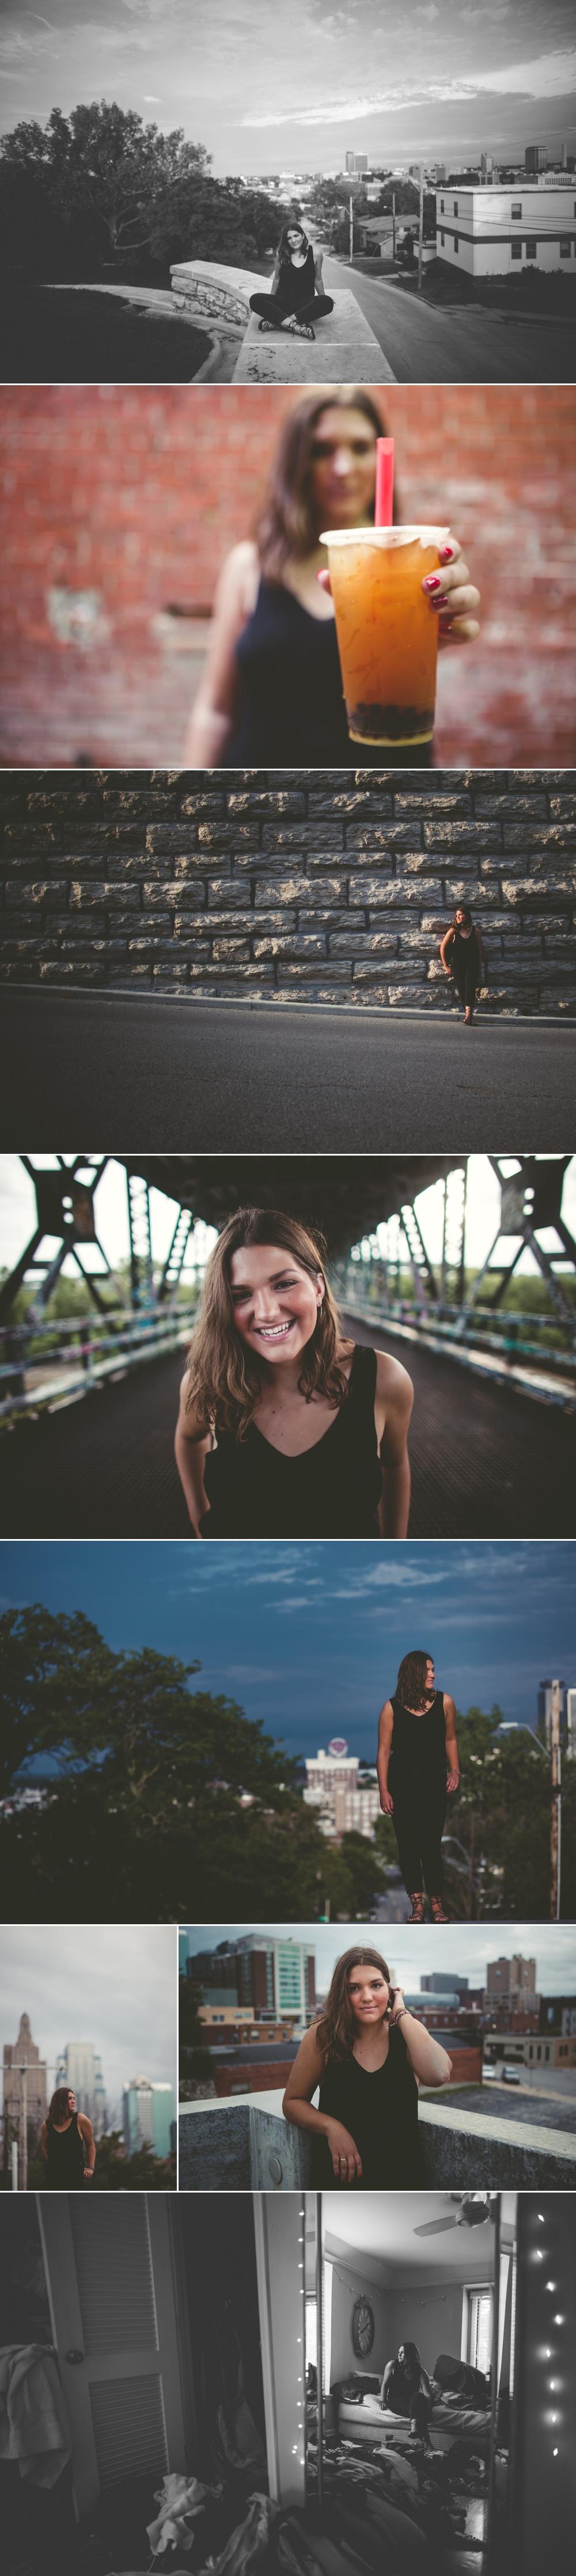 jason_domingues_photography_best_kansas_city_photographer_senior_portraits_02